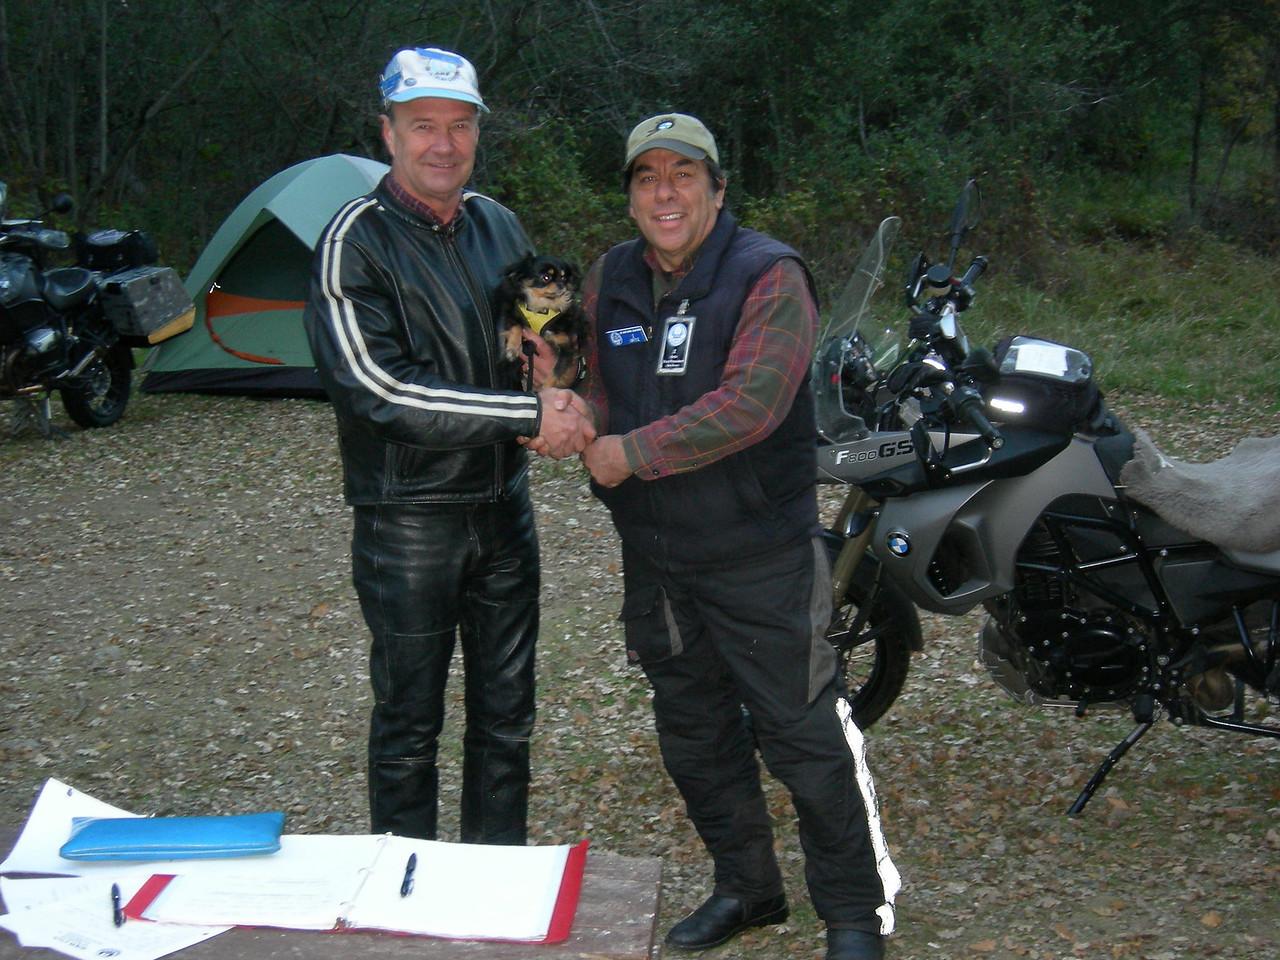 Steve Wilson receives his 35-year membership pin.